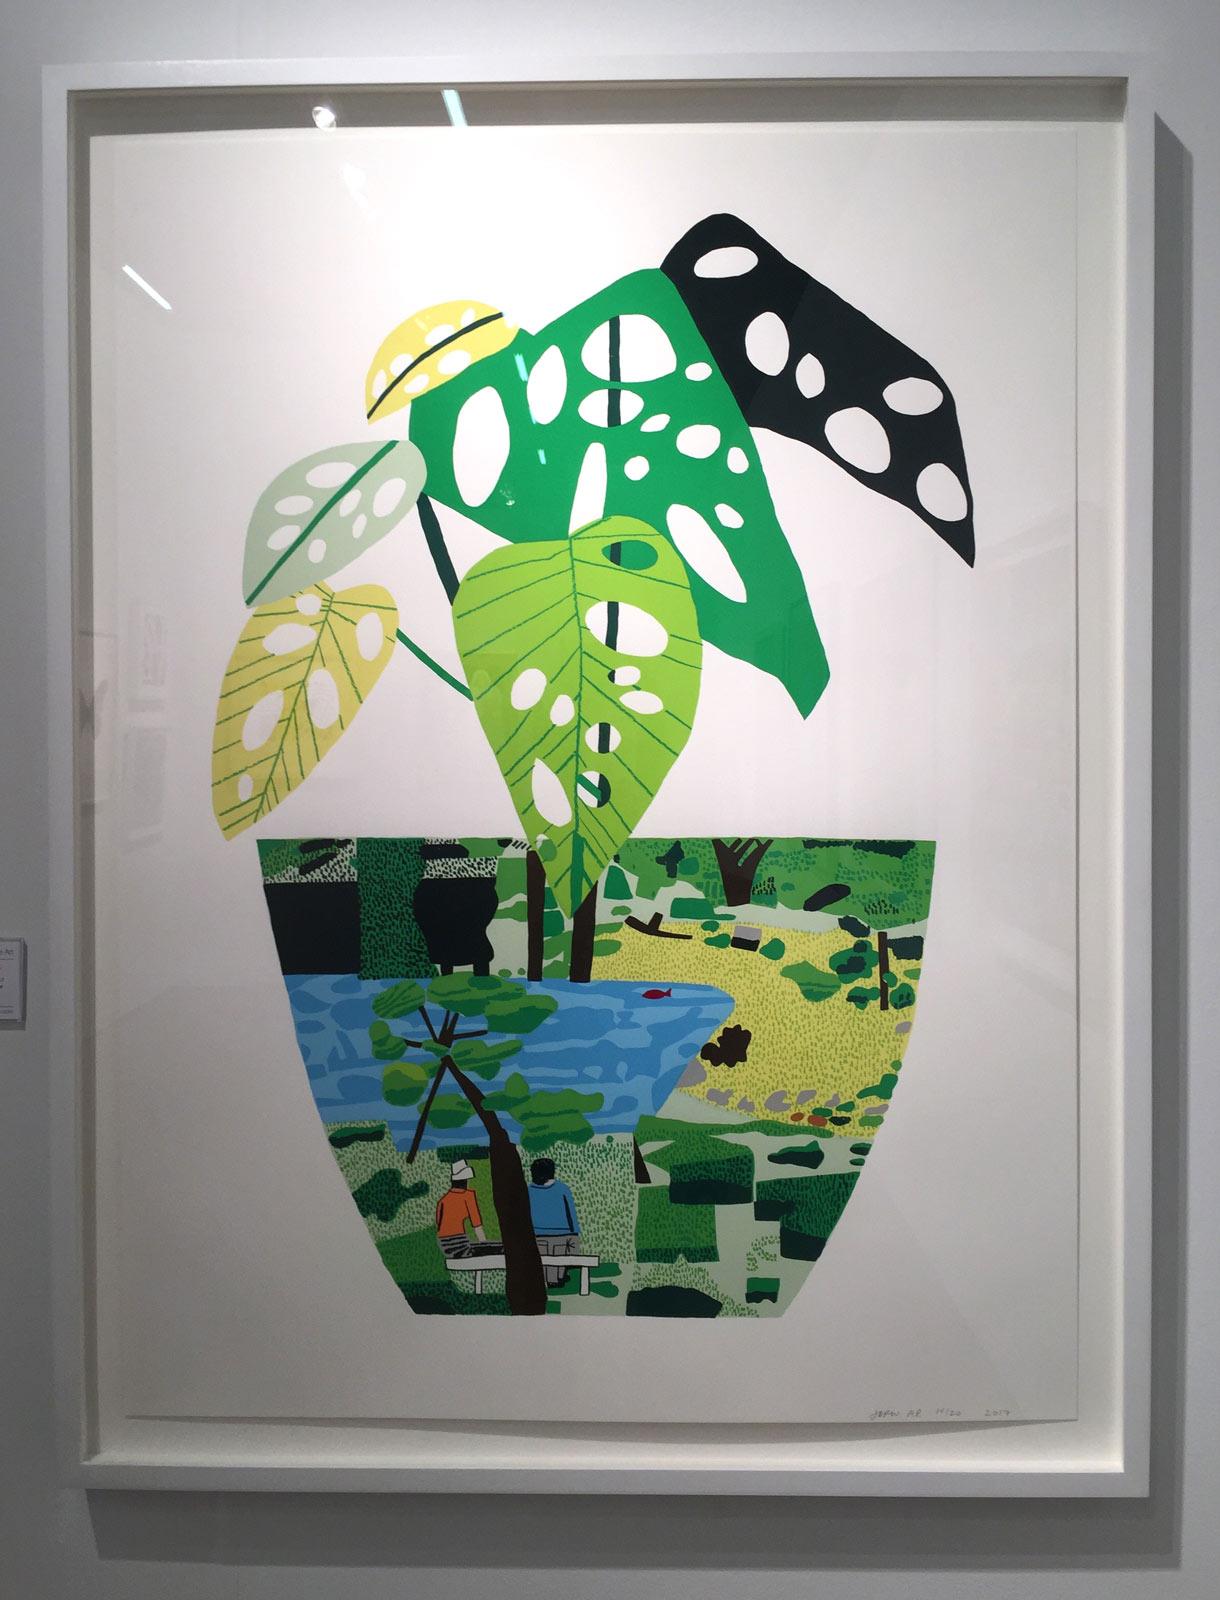 Jonas-Wood-Landscape-Pot-with-Plant-screenprint-paper.jpg